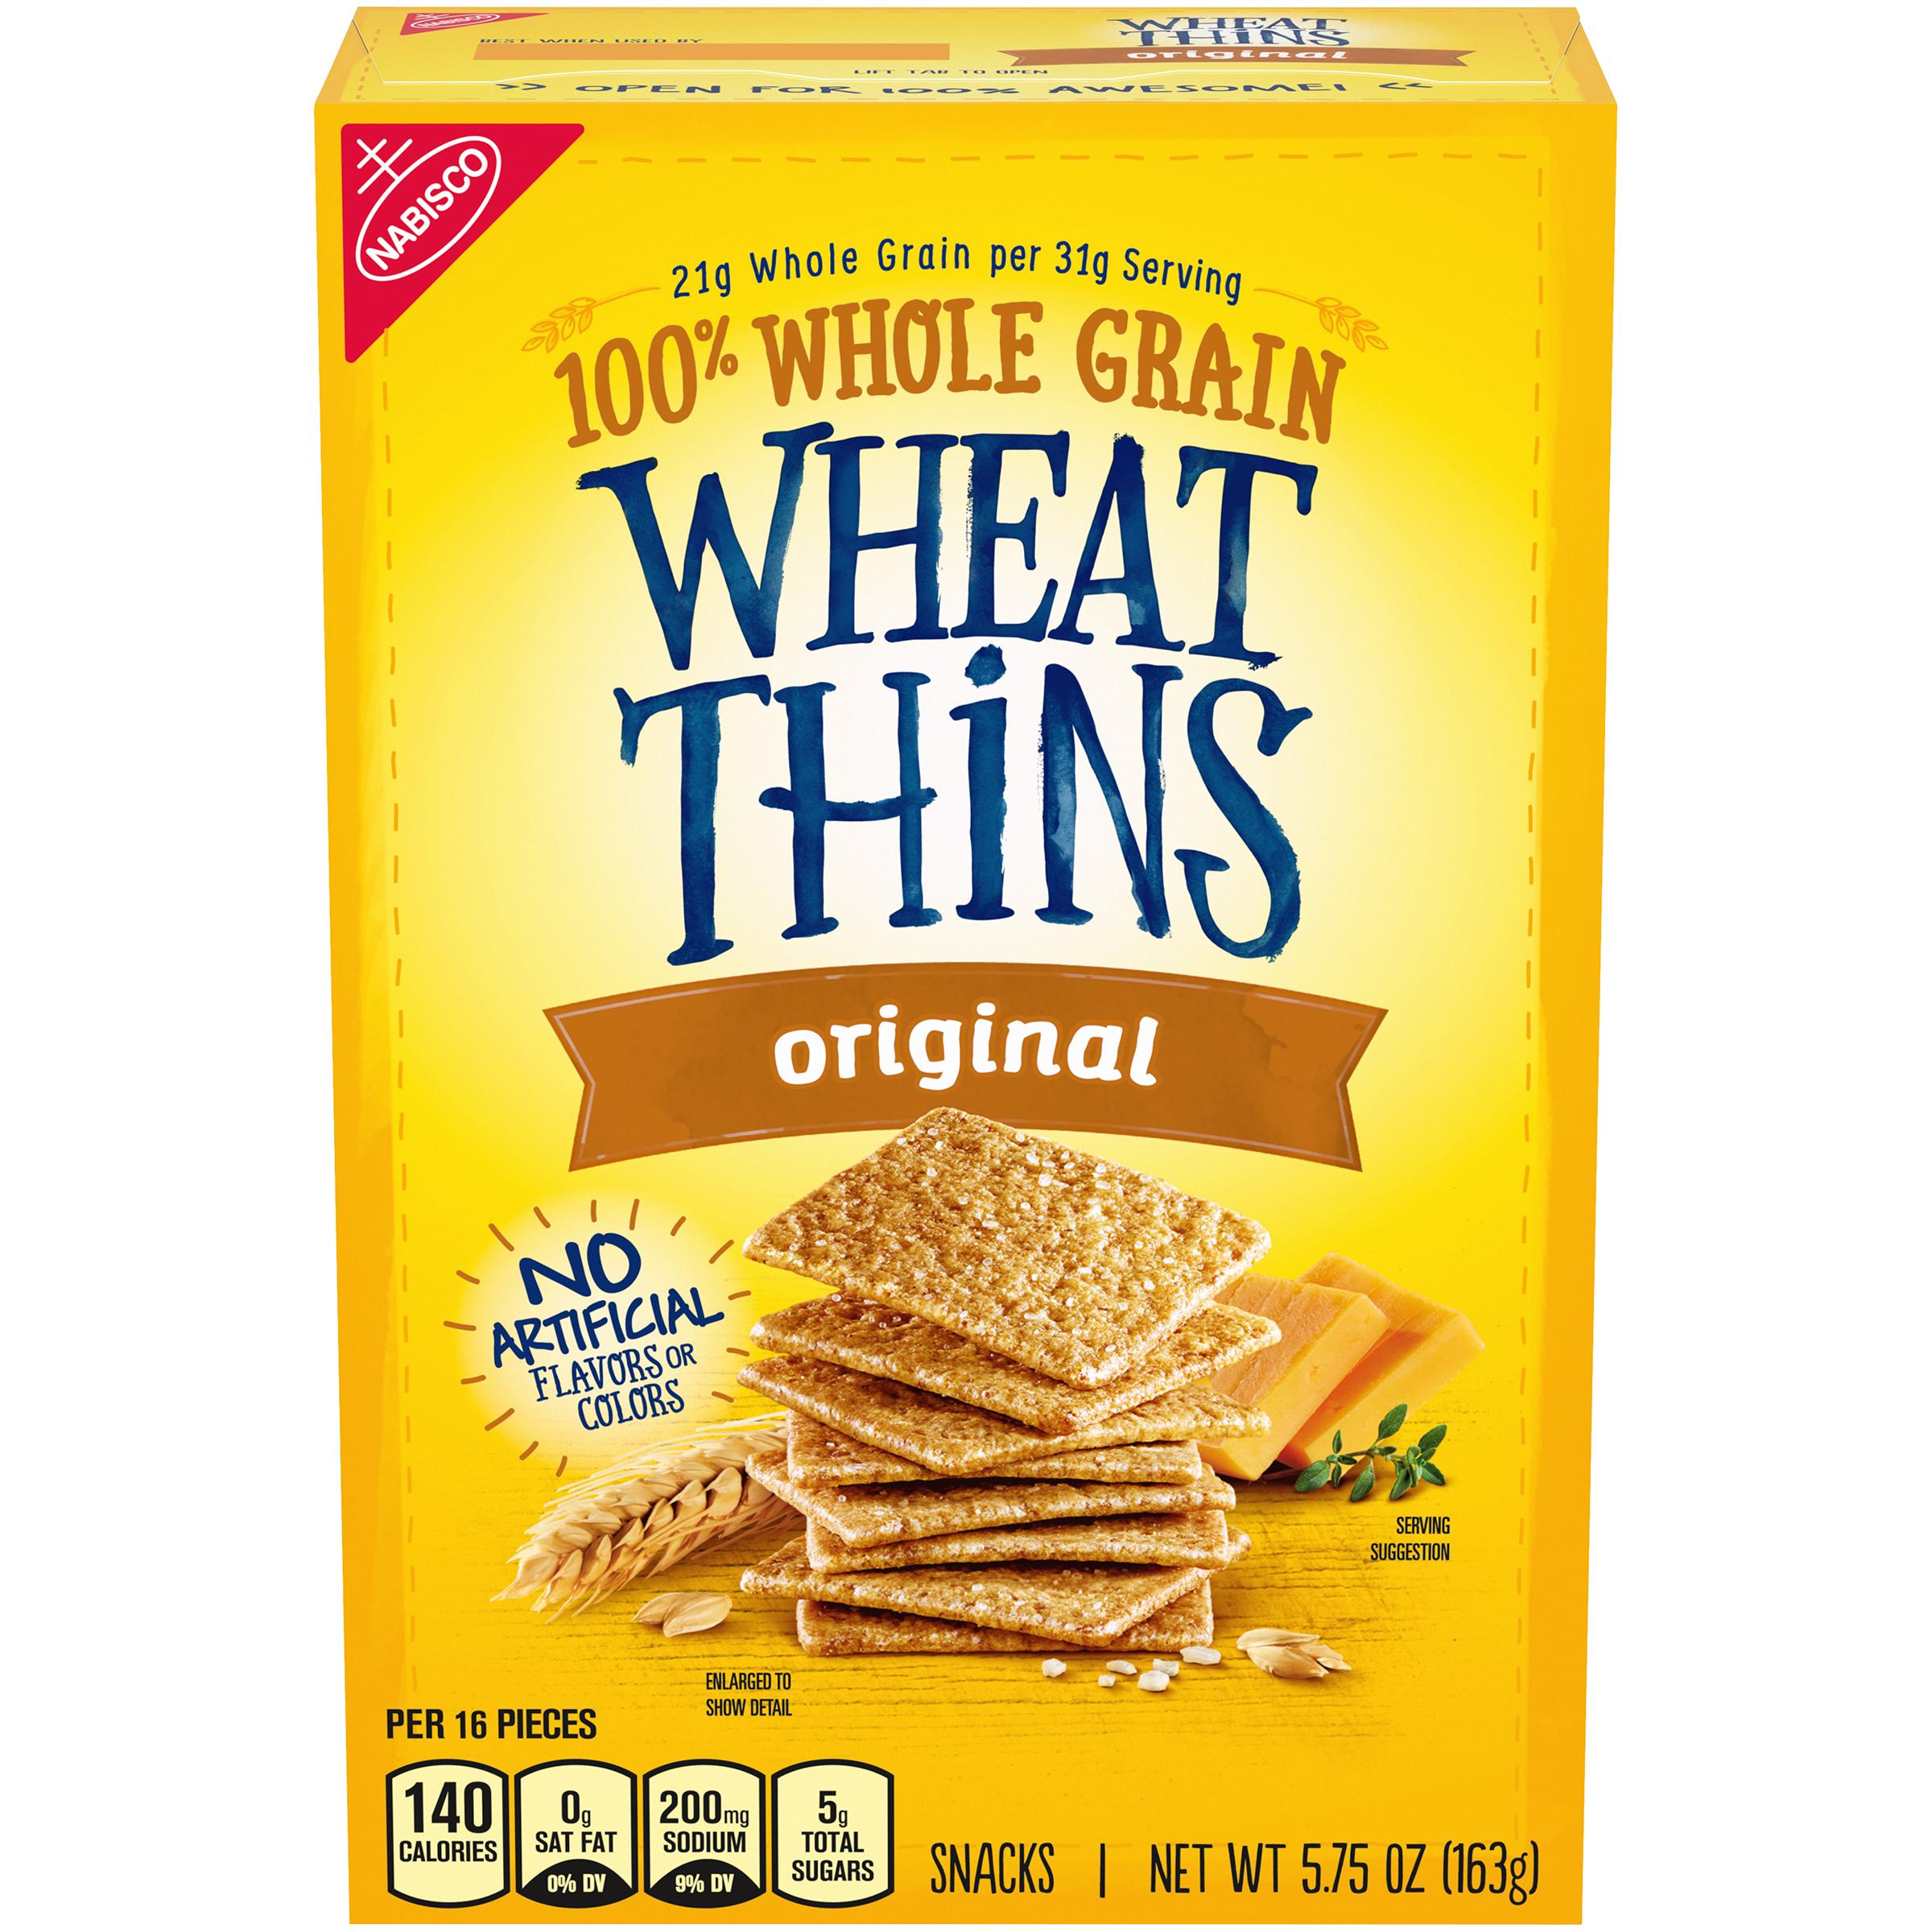 WHEAT THINS Original Crackers 5.78 Oz